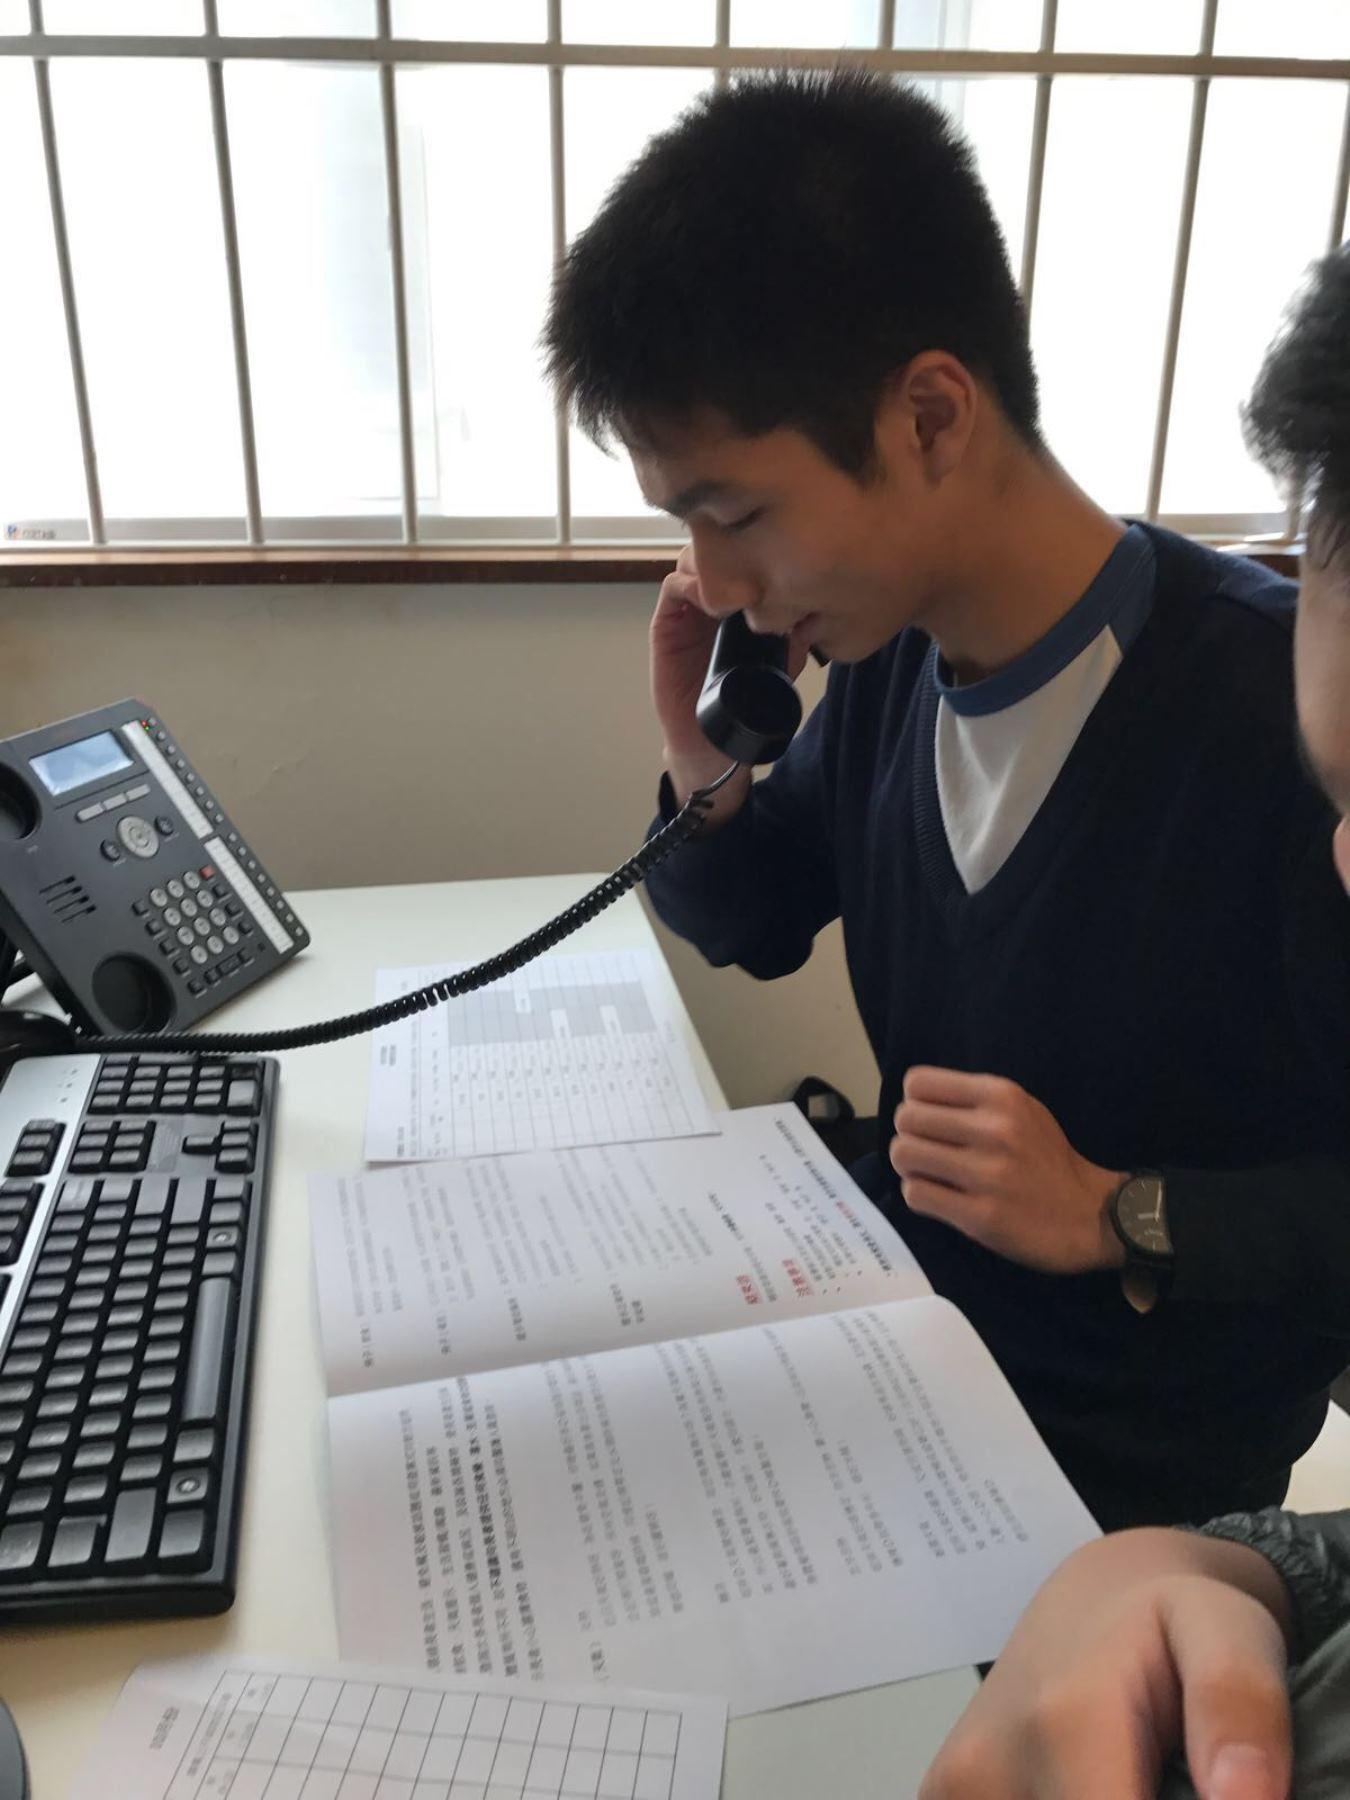 http://npc.edu.hk/sites/default/files/9_270.jpg